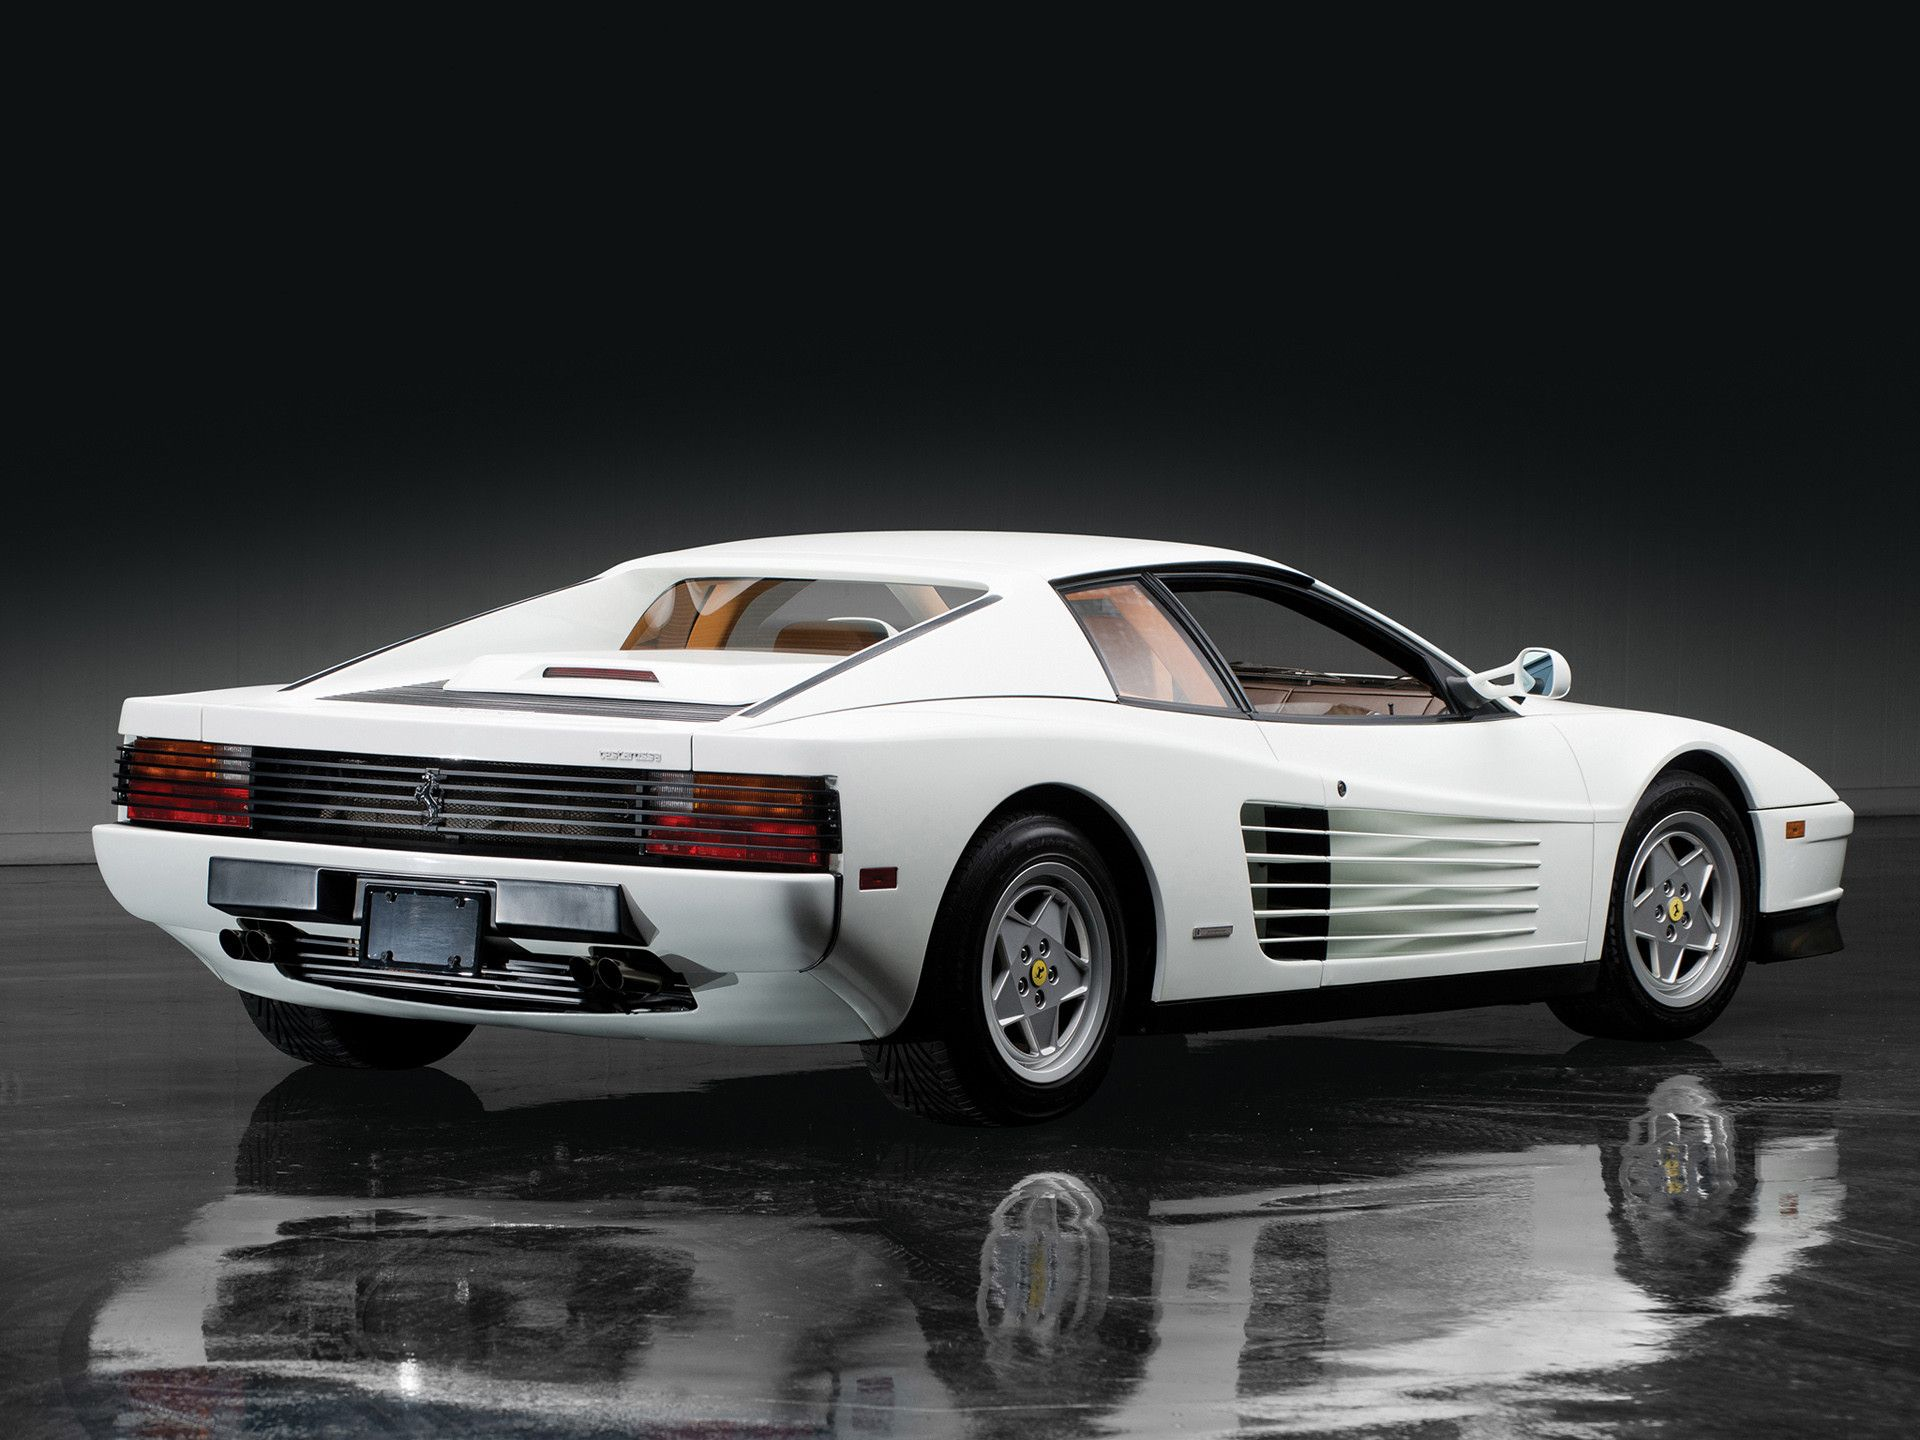 Ferrari Testarossa Wallpapers Top Free Ferrari Testarossa Backgrounds Wallpaperaccess